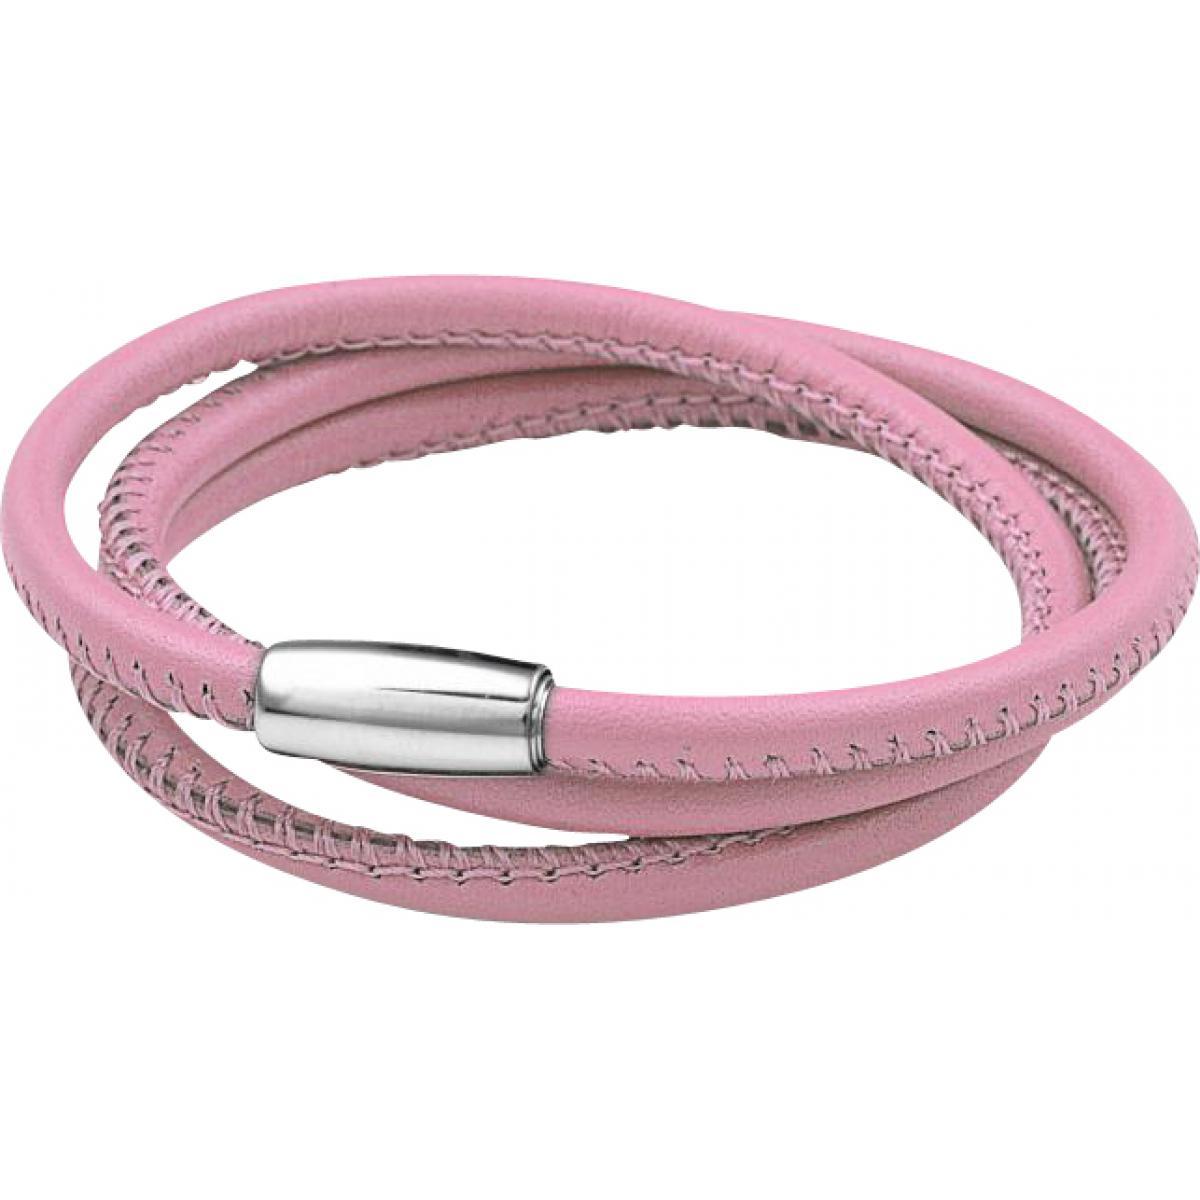 bracelet femme tissu